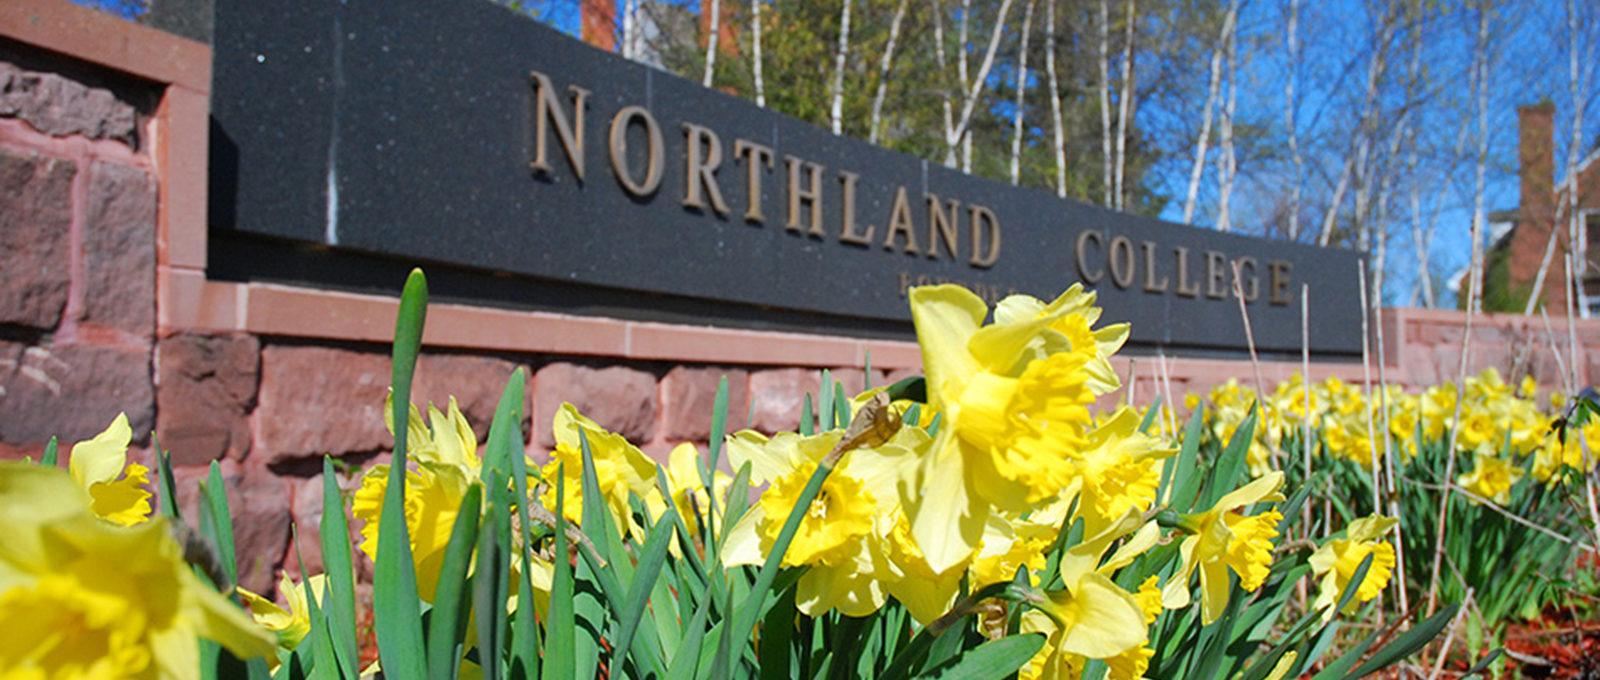 Northland sign